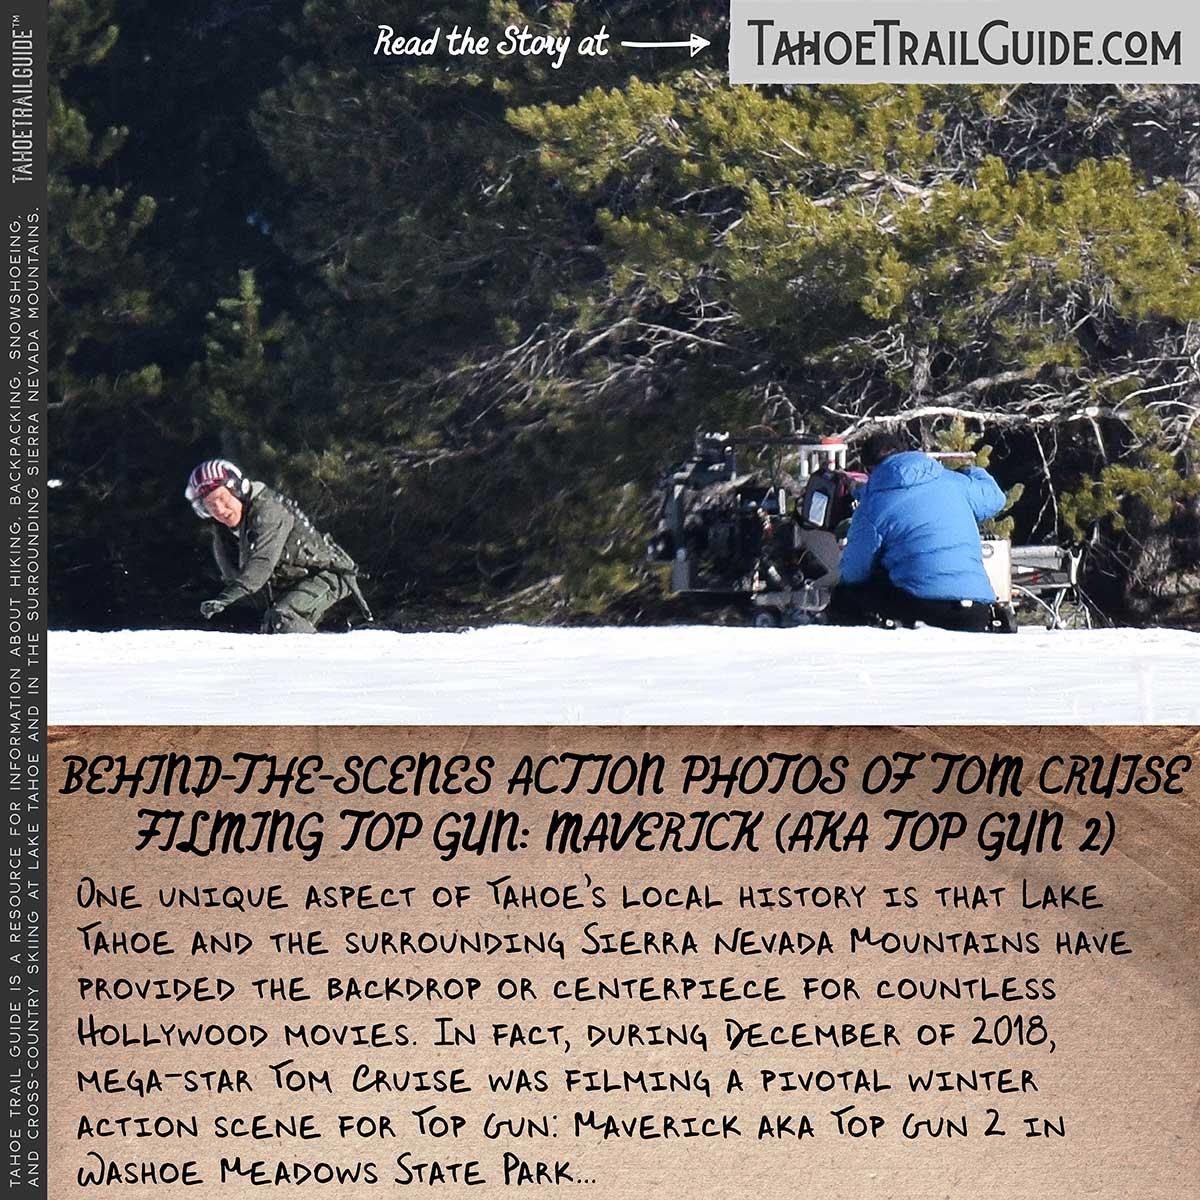 Tom Cruise filming Top Gun: Maverick in snow